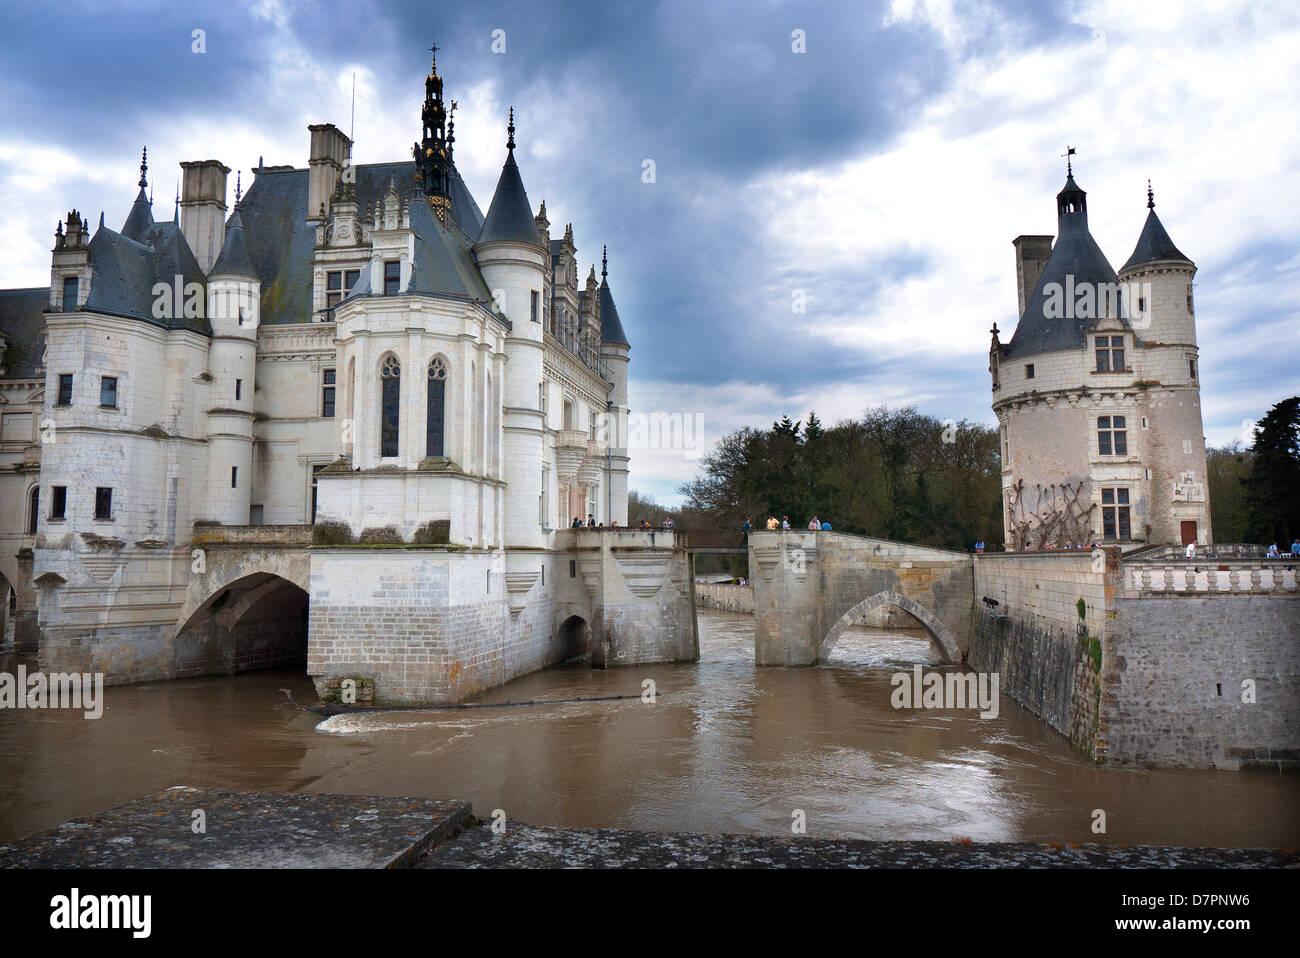 Château de Chenonceau, en el Loira, Francia. Imagen De Stock